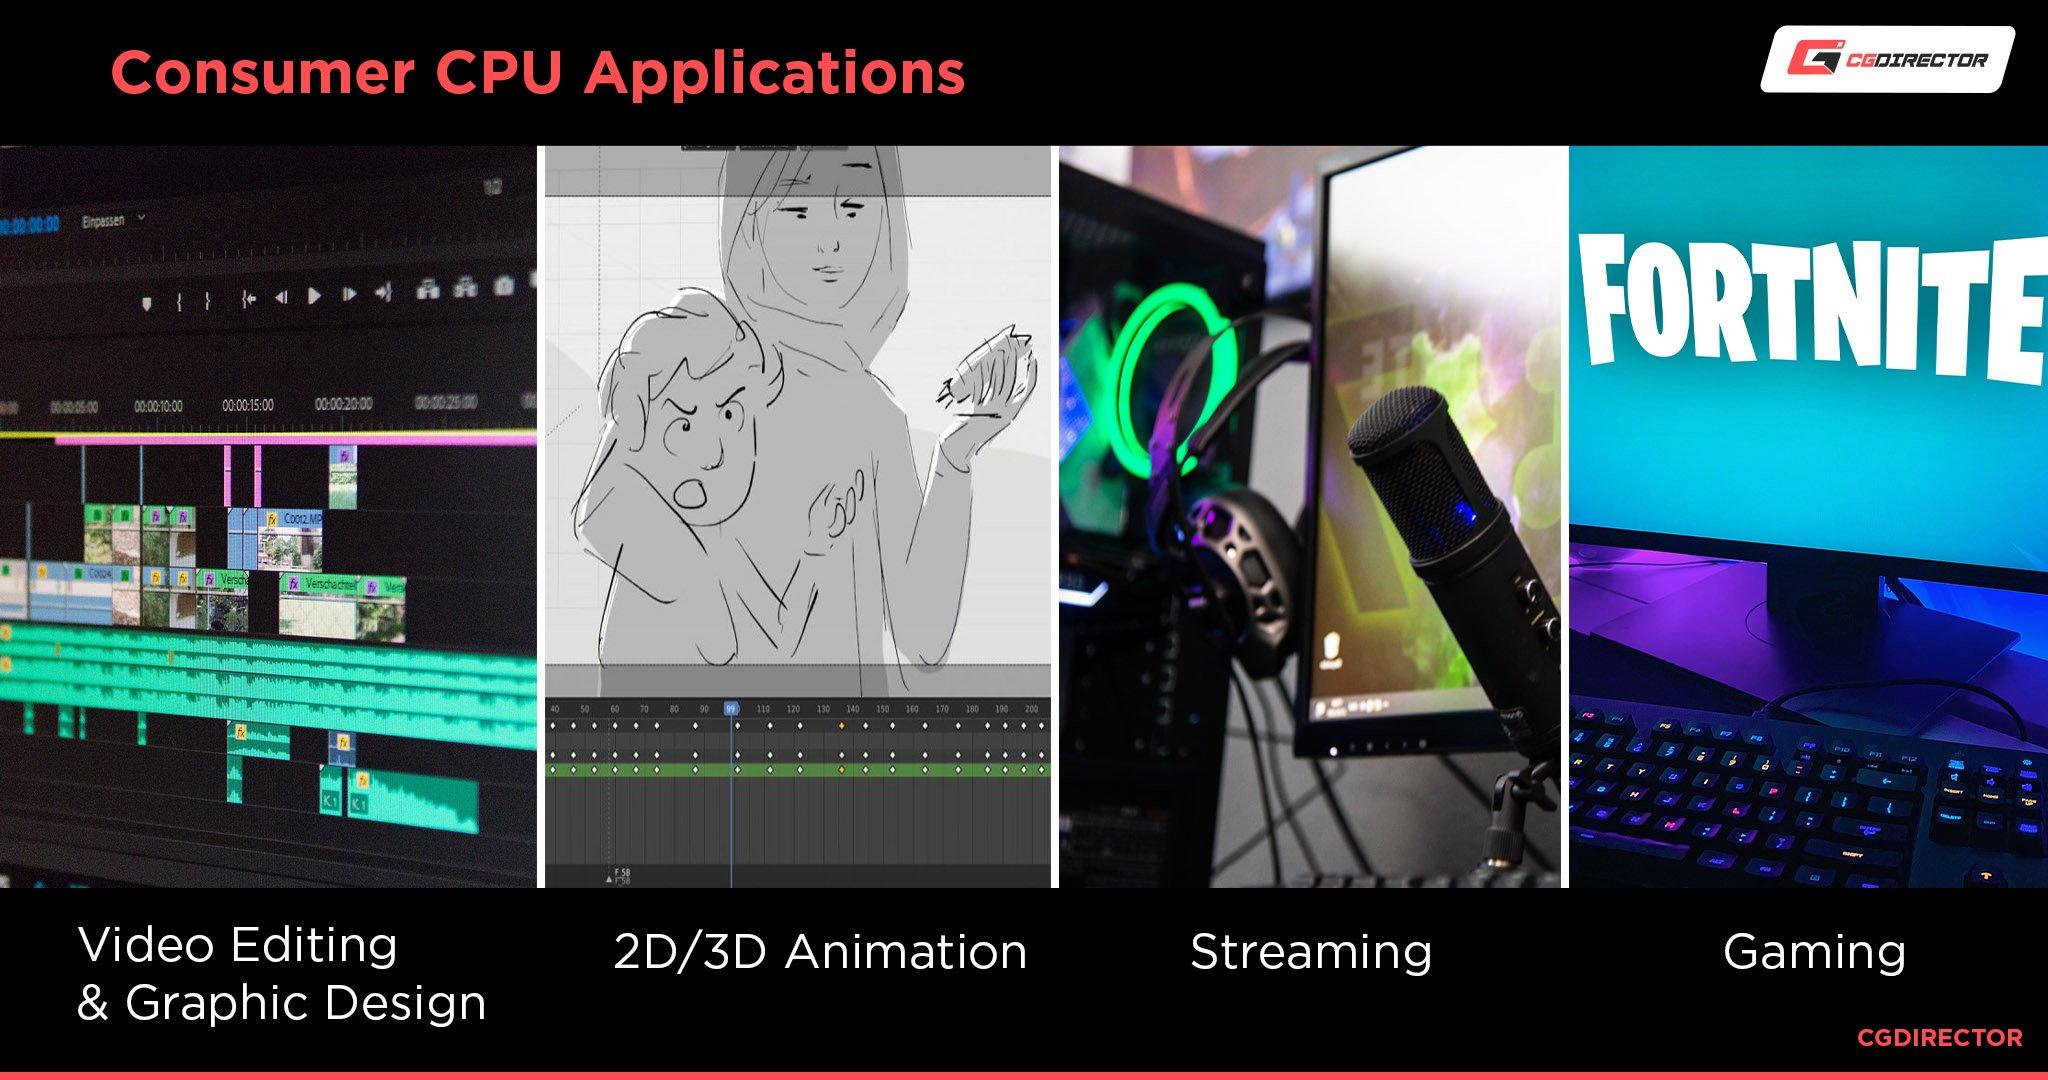 Consumer CPU Applications